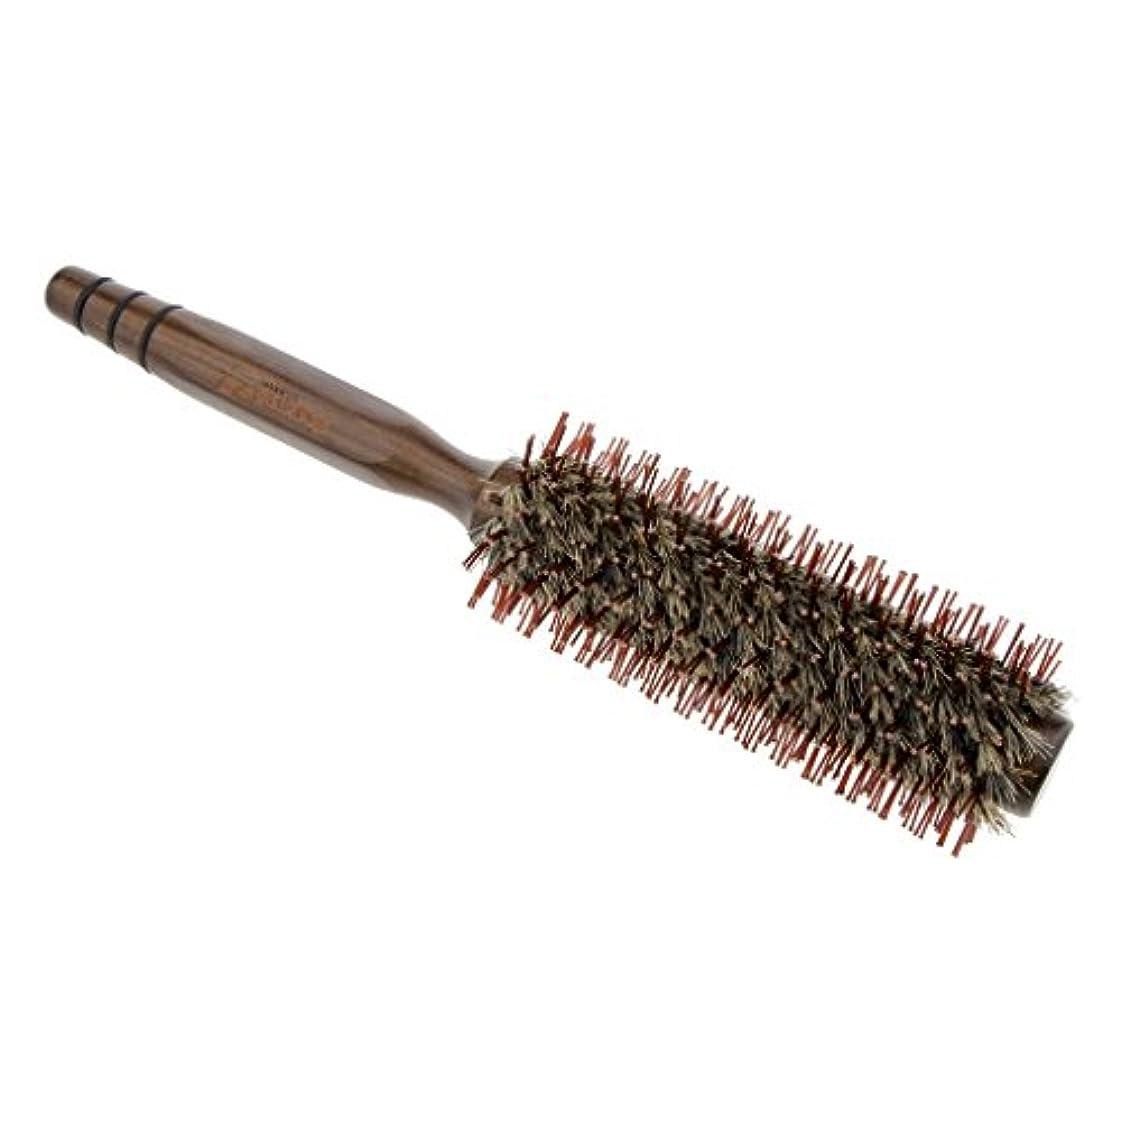 Homyl ロールブラシ ヘアコーム 木製櫛 高品質 家庭用 サロン 美容師 3サイズ - L